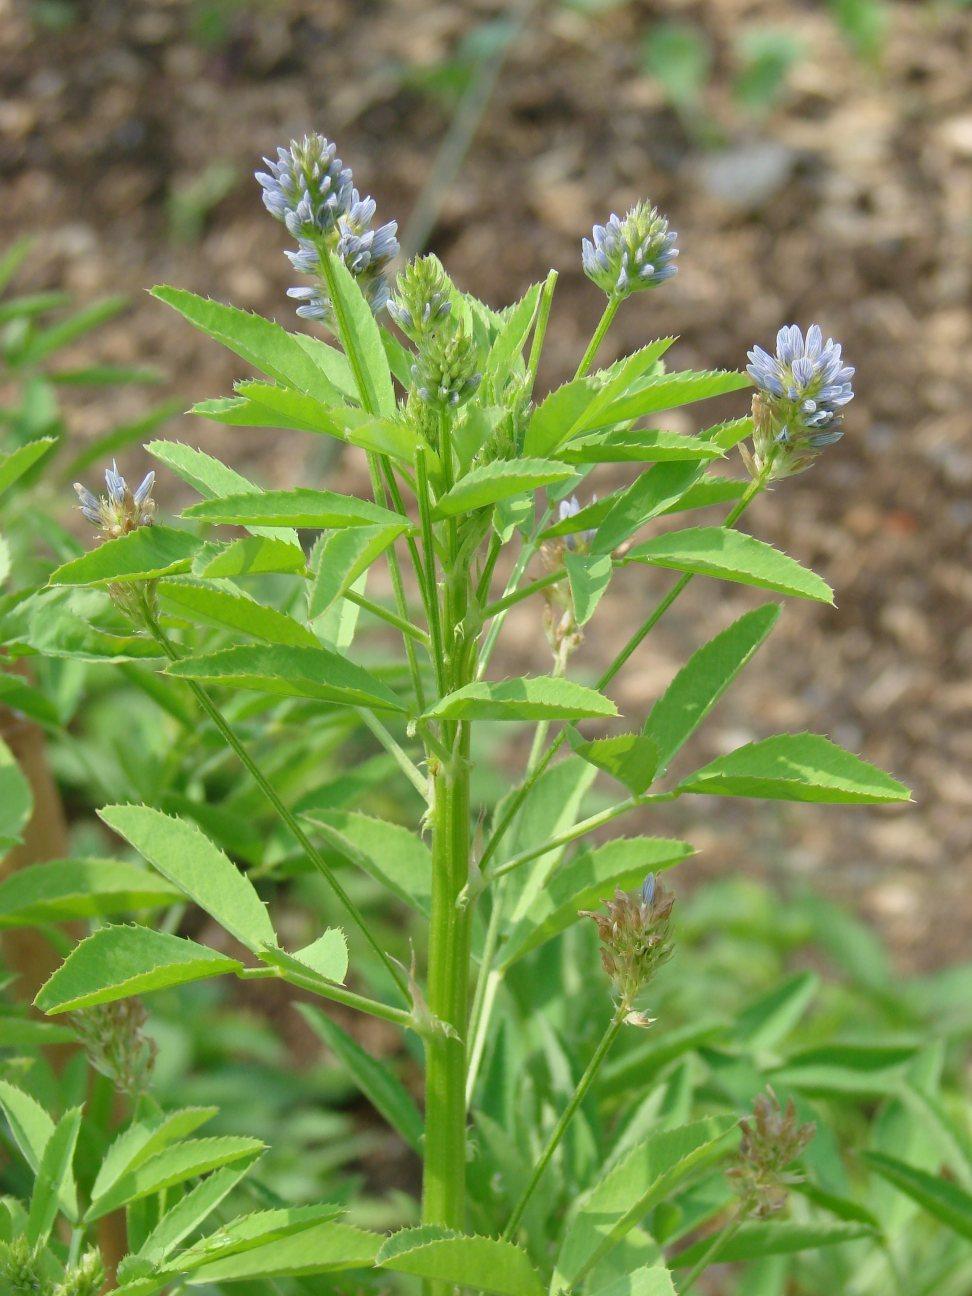 Image of blue fenugreek